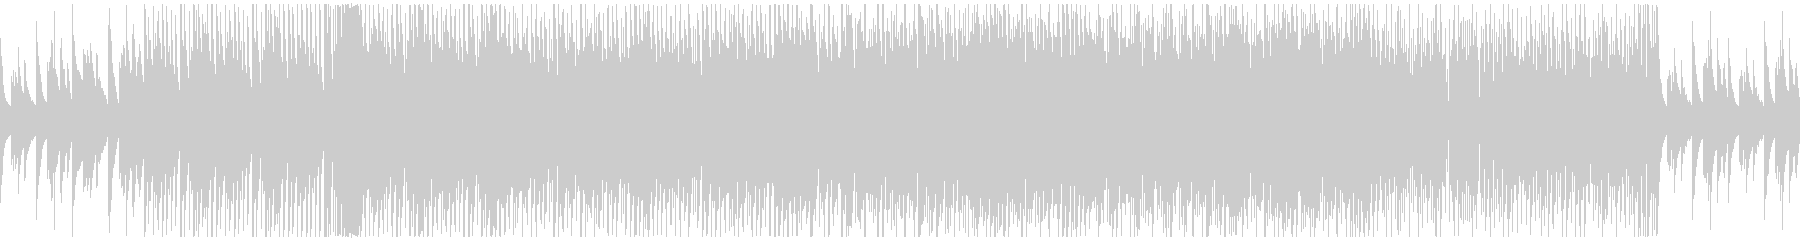 JAZZにEDMをMIXしたBGMの未再生の波形